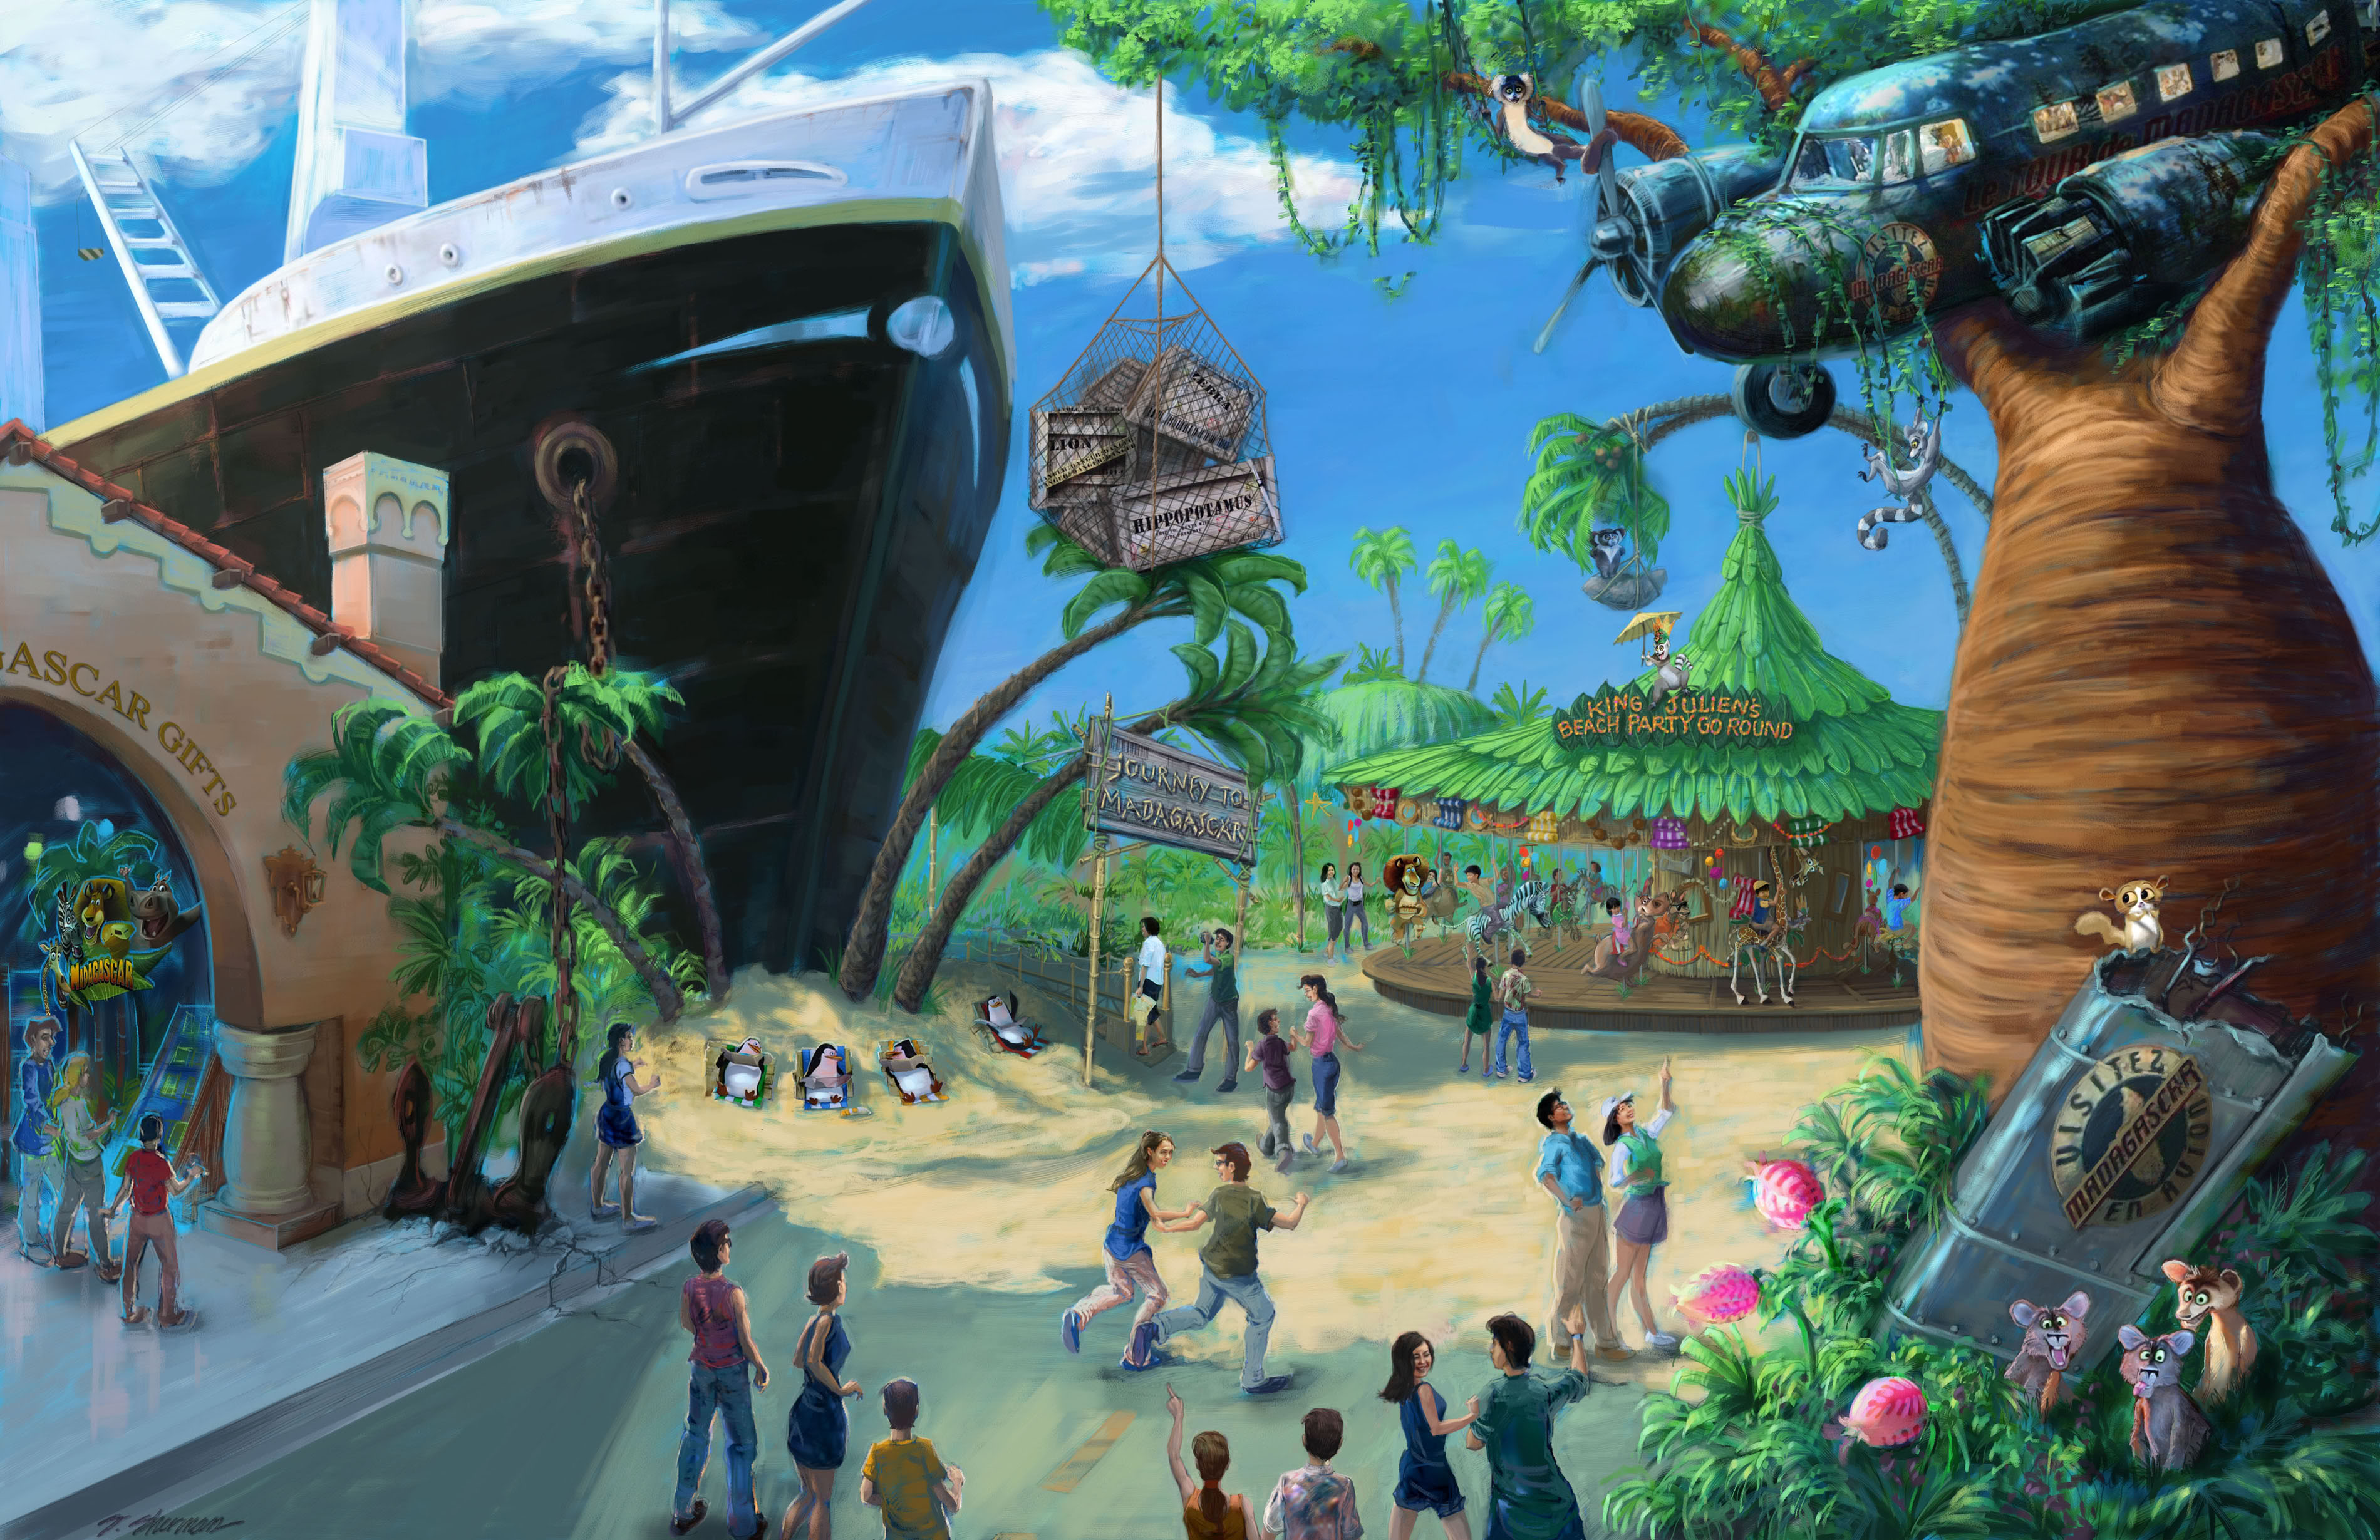 [Singapour] Universal Studios Singapore (2010) - Page 2 Artistimpression